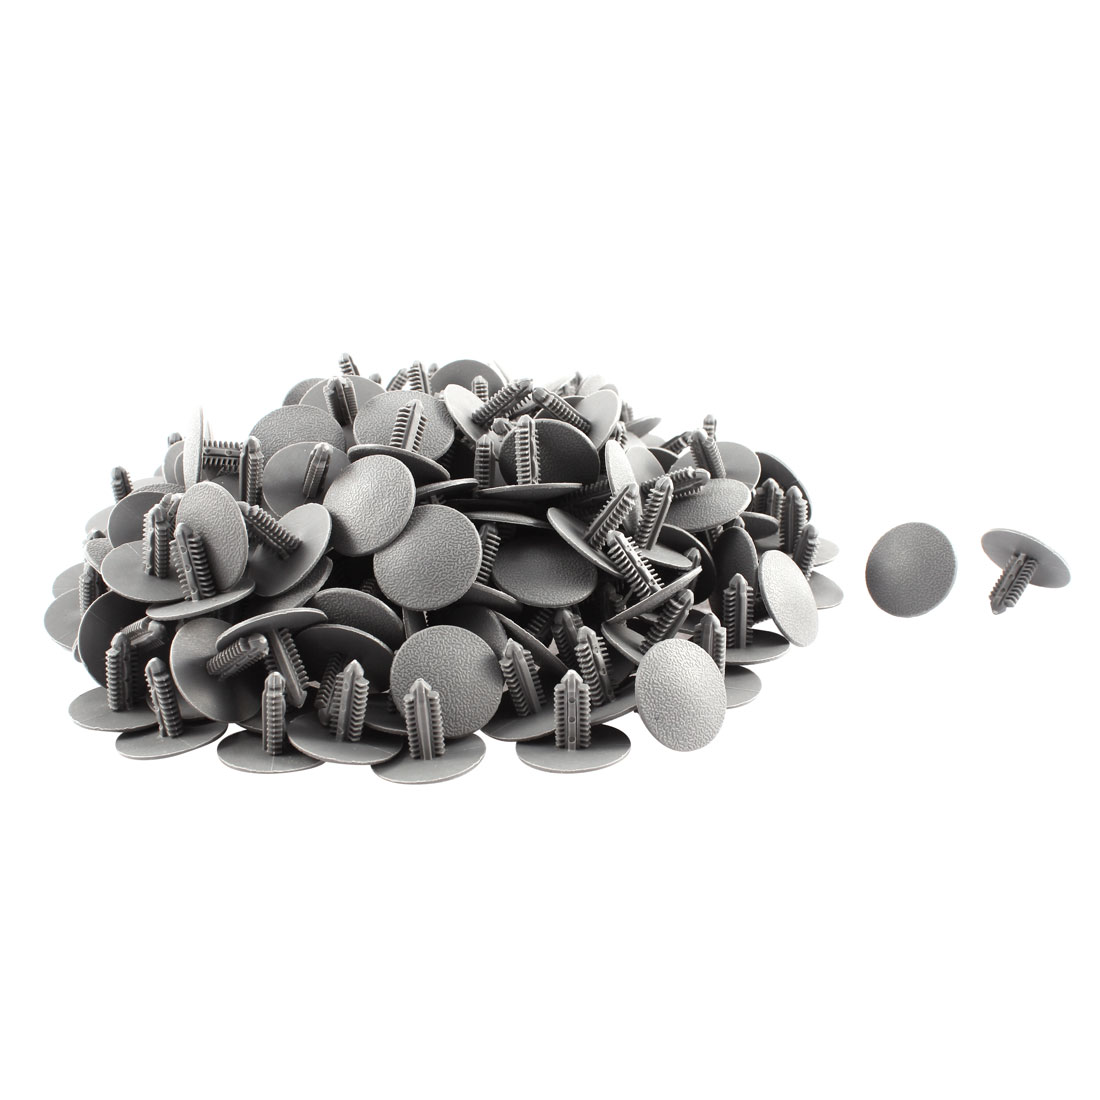 200 Pcs Gray Plastic Rivet Trim Fastener Retainer Clips 7mm x 17mm x 25mm